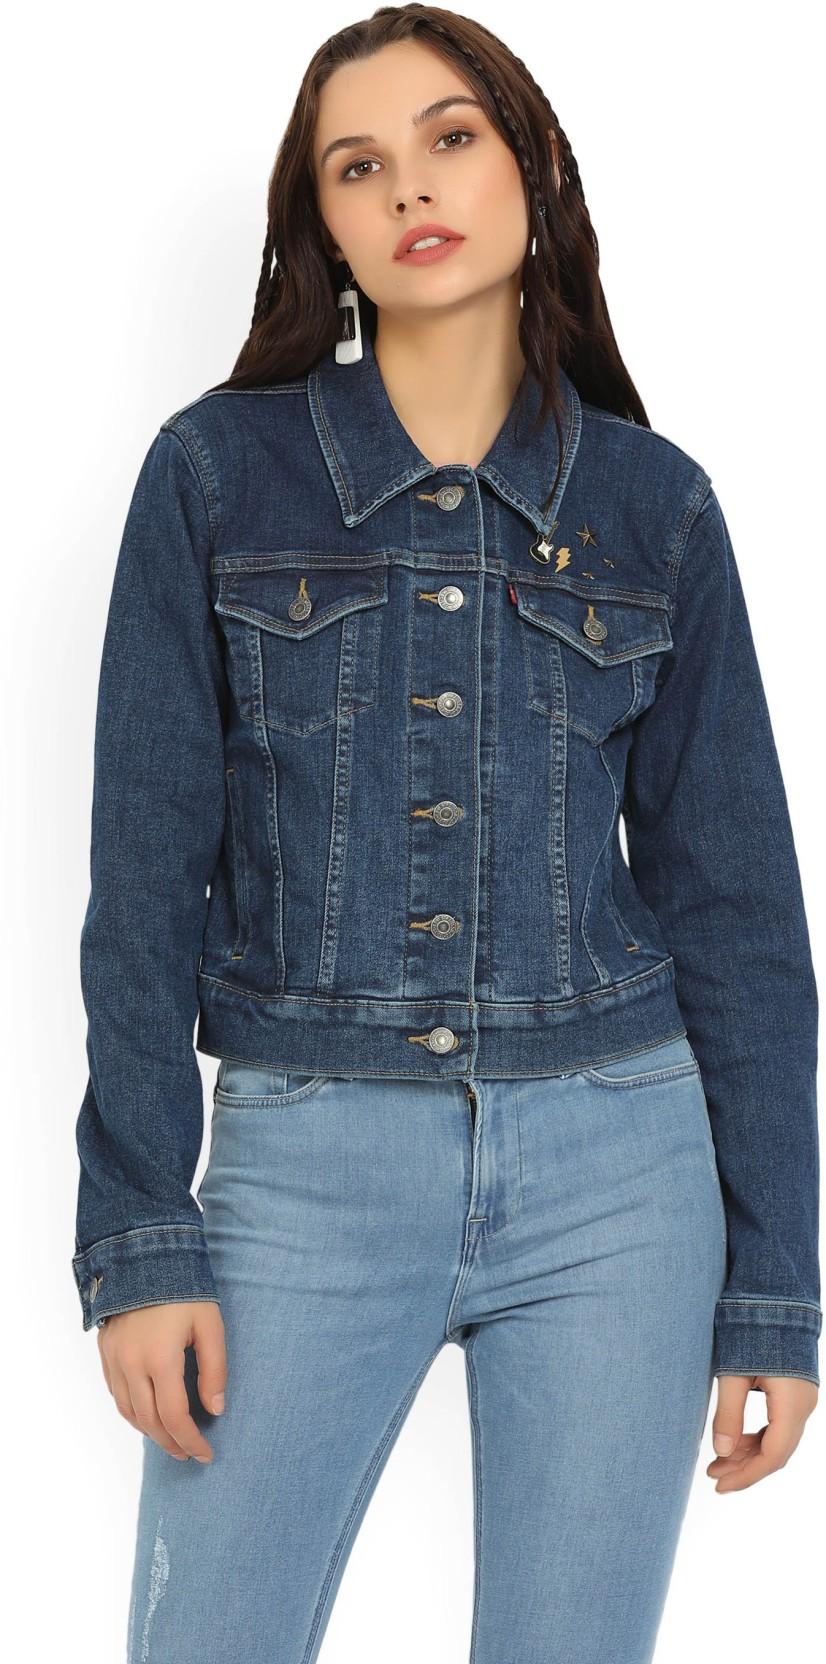 4ad1f8ae01546 Levi s Full Sleeve Solid Women s Denim Jacket - Buy Blue Levi s Full ...